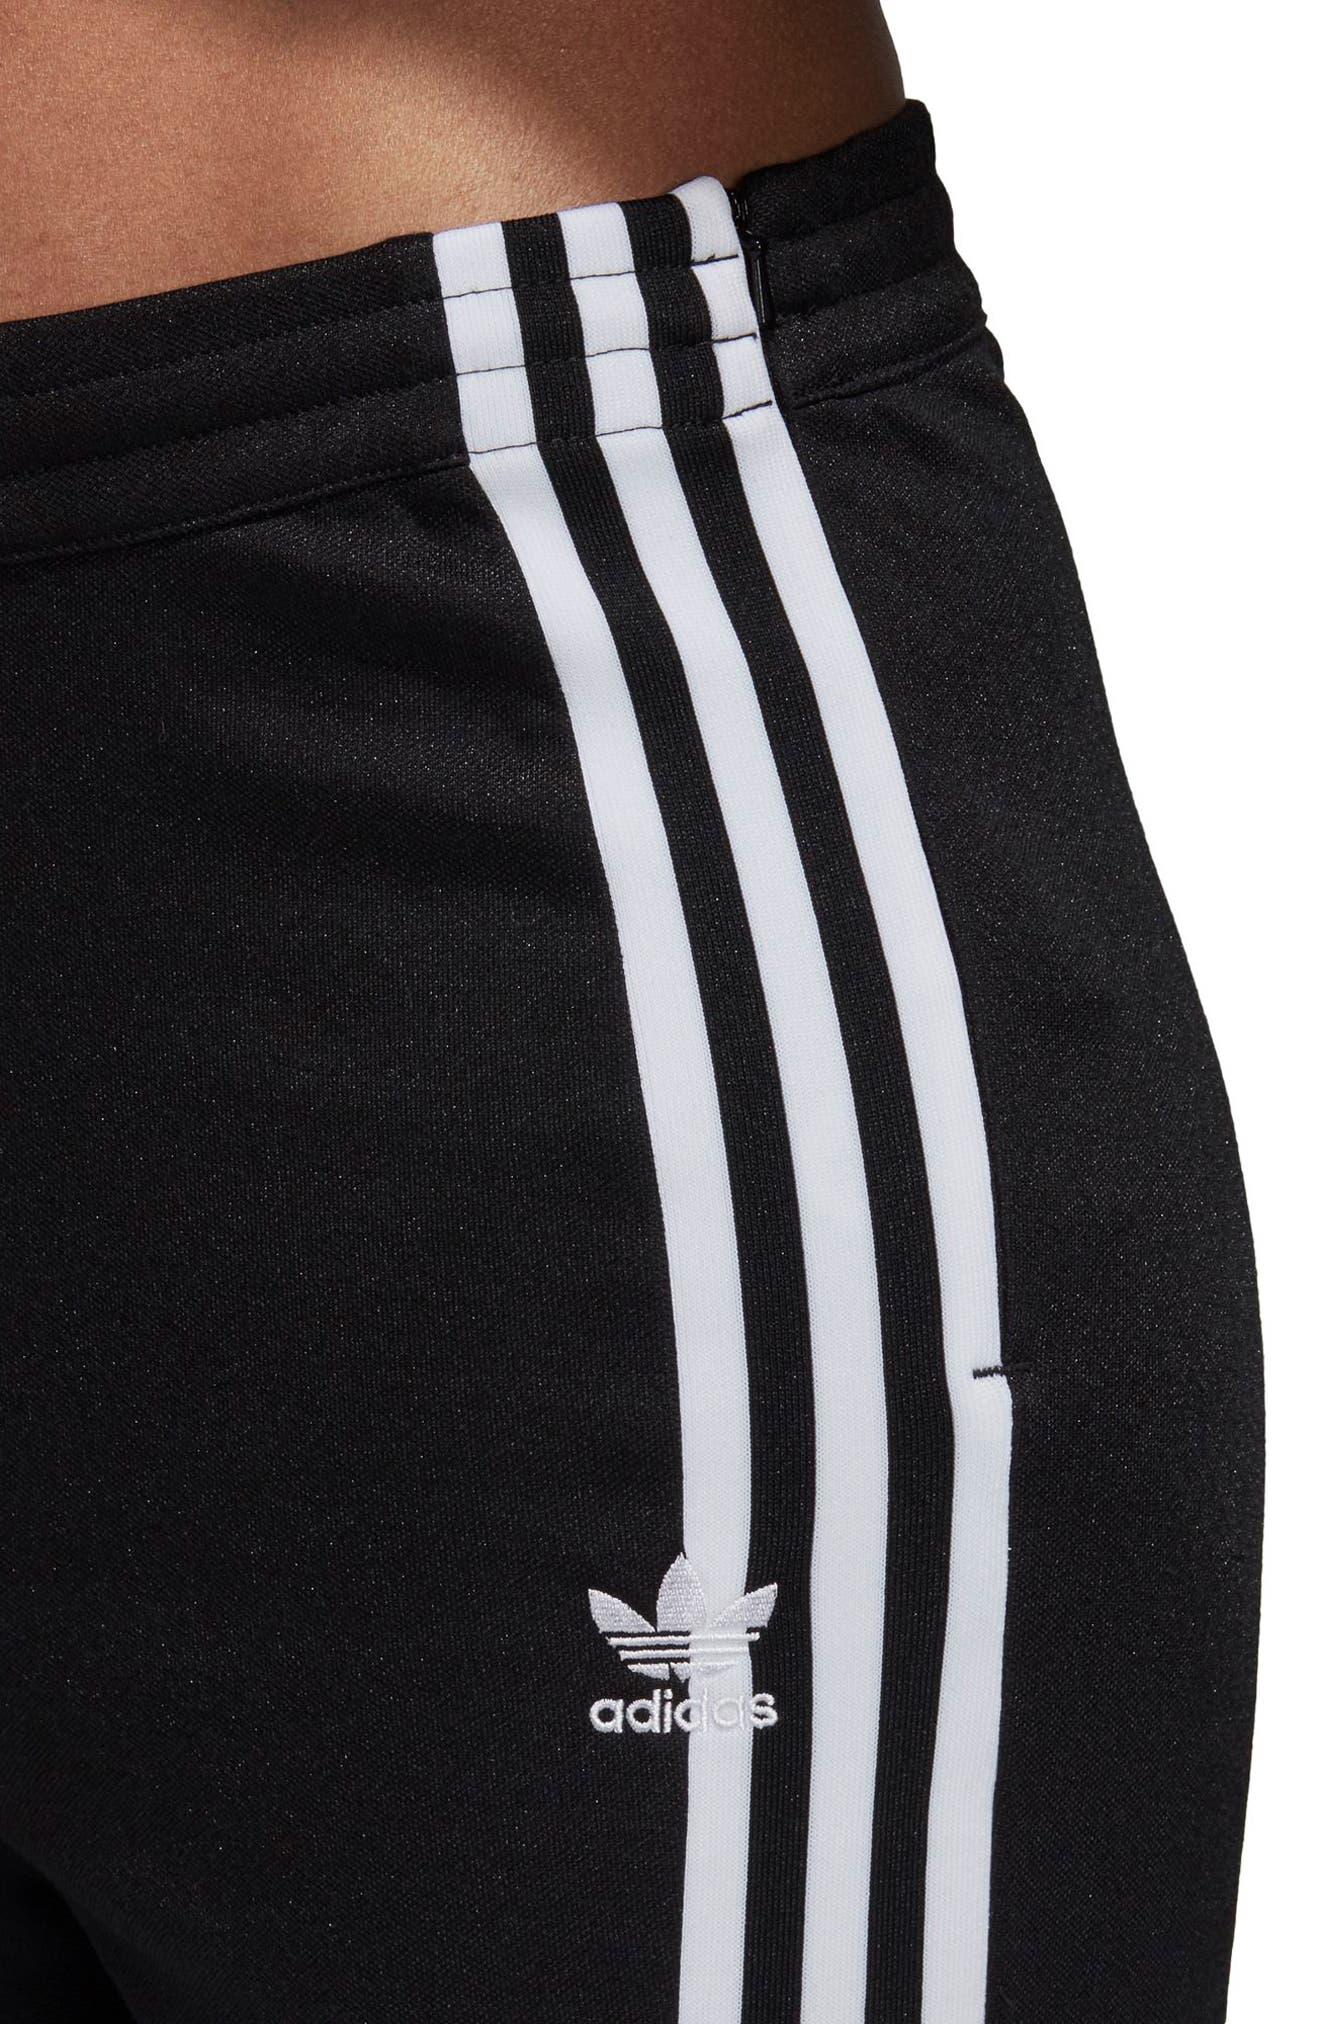 adidas 3 Stripe Track Pants,                             Alternate thumbnail 8, color,                             BLACK